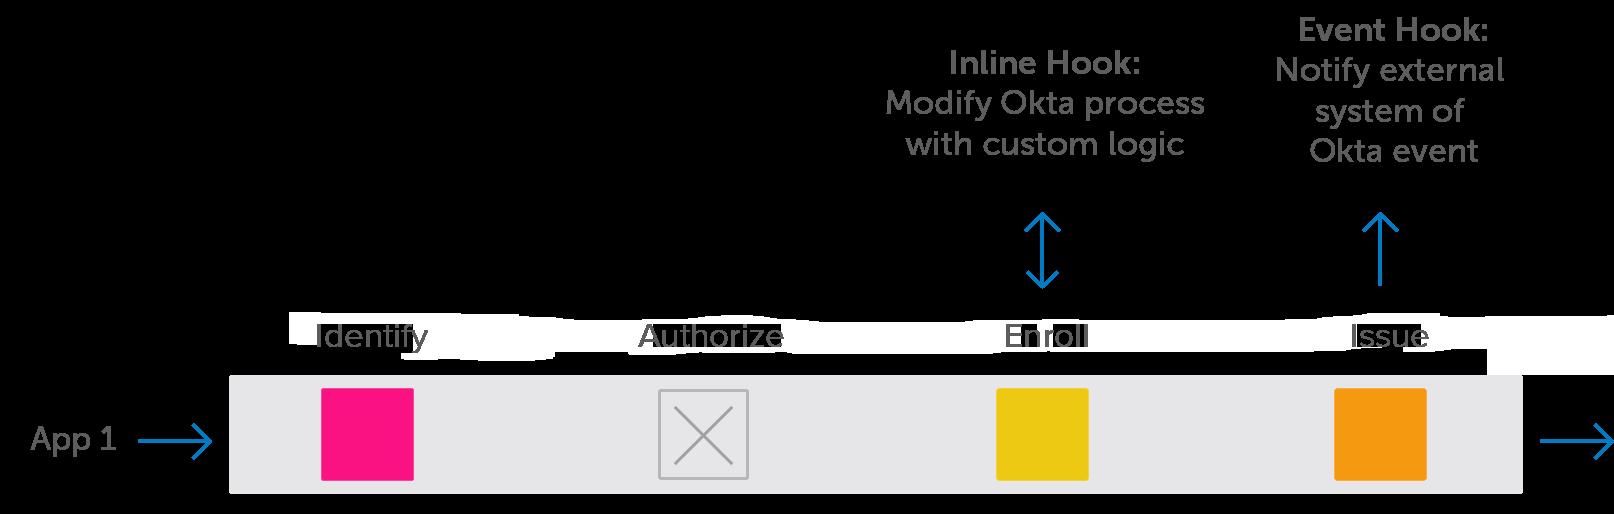 Okta Identity Engine Hooks New